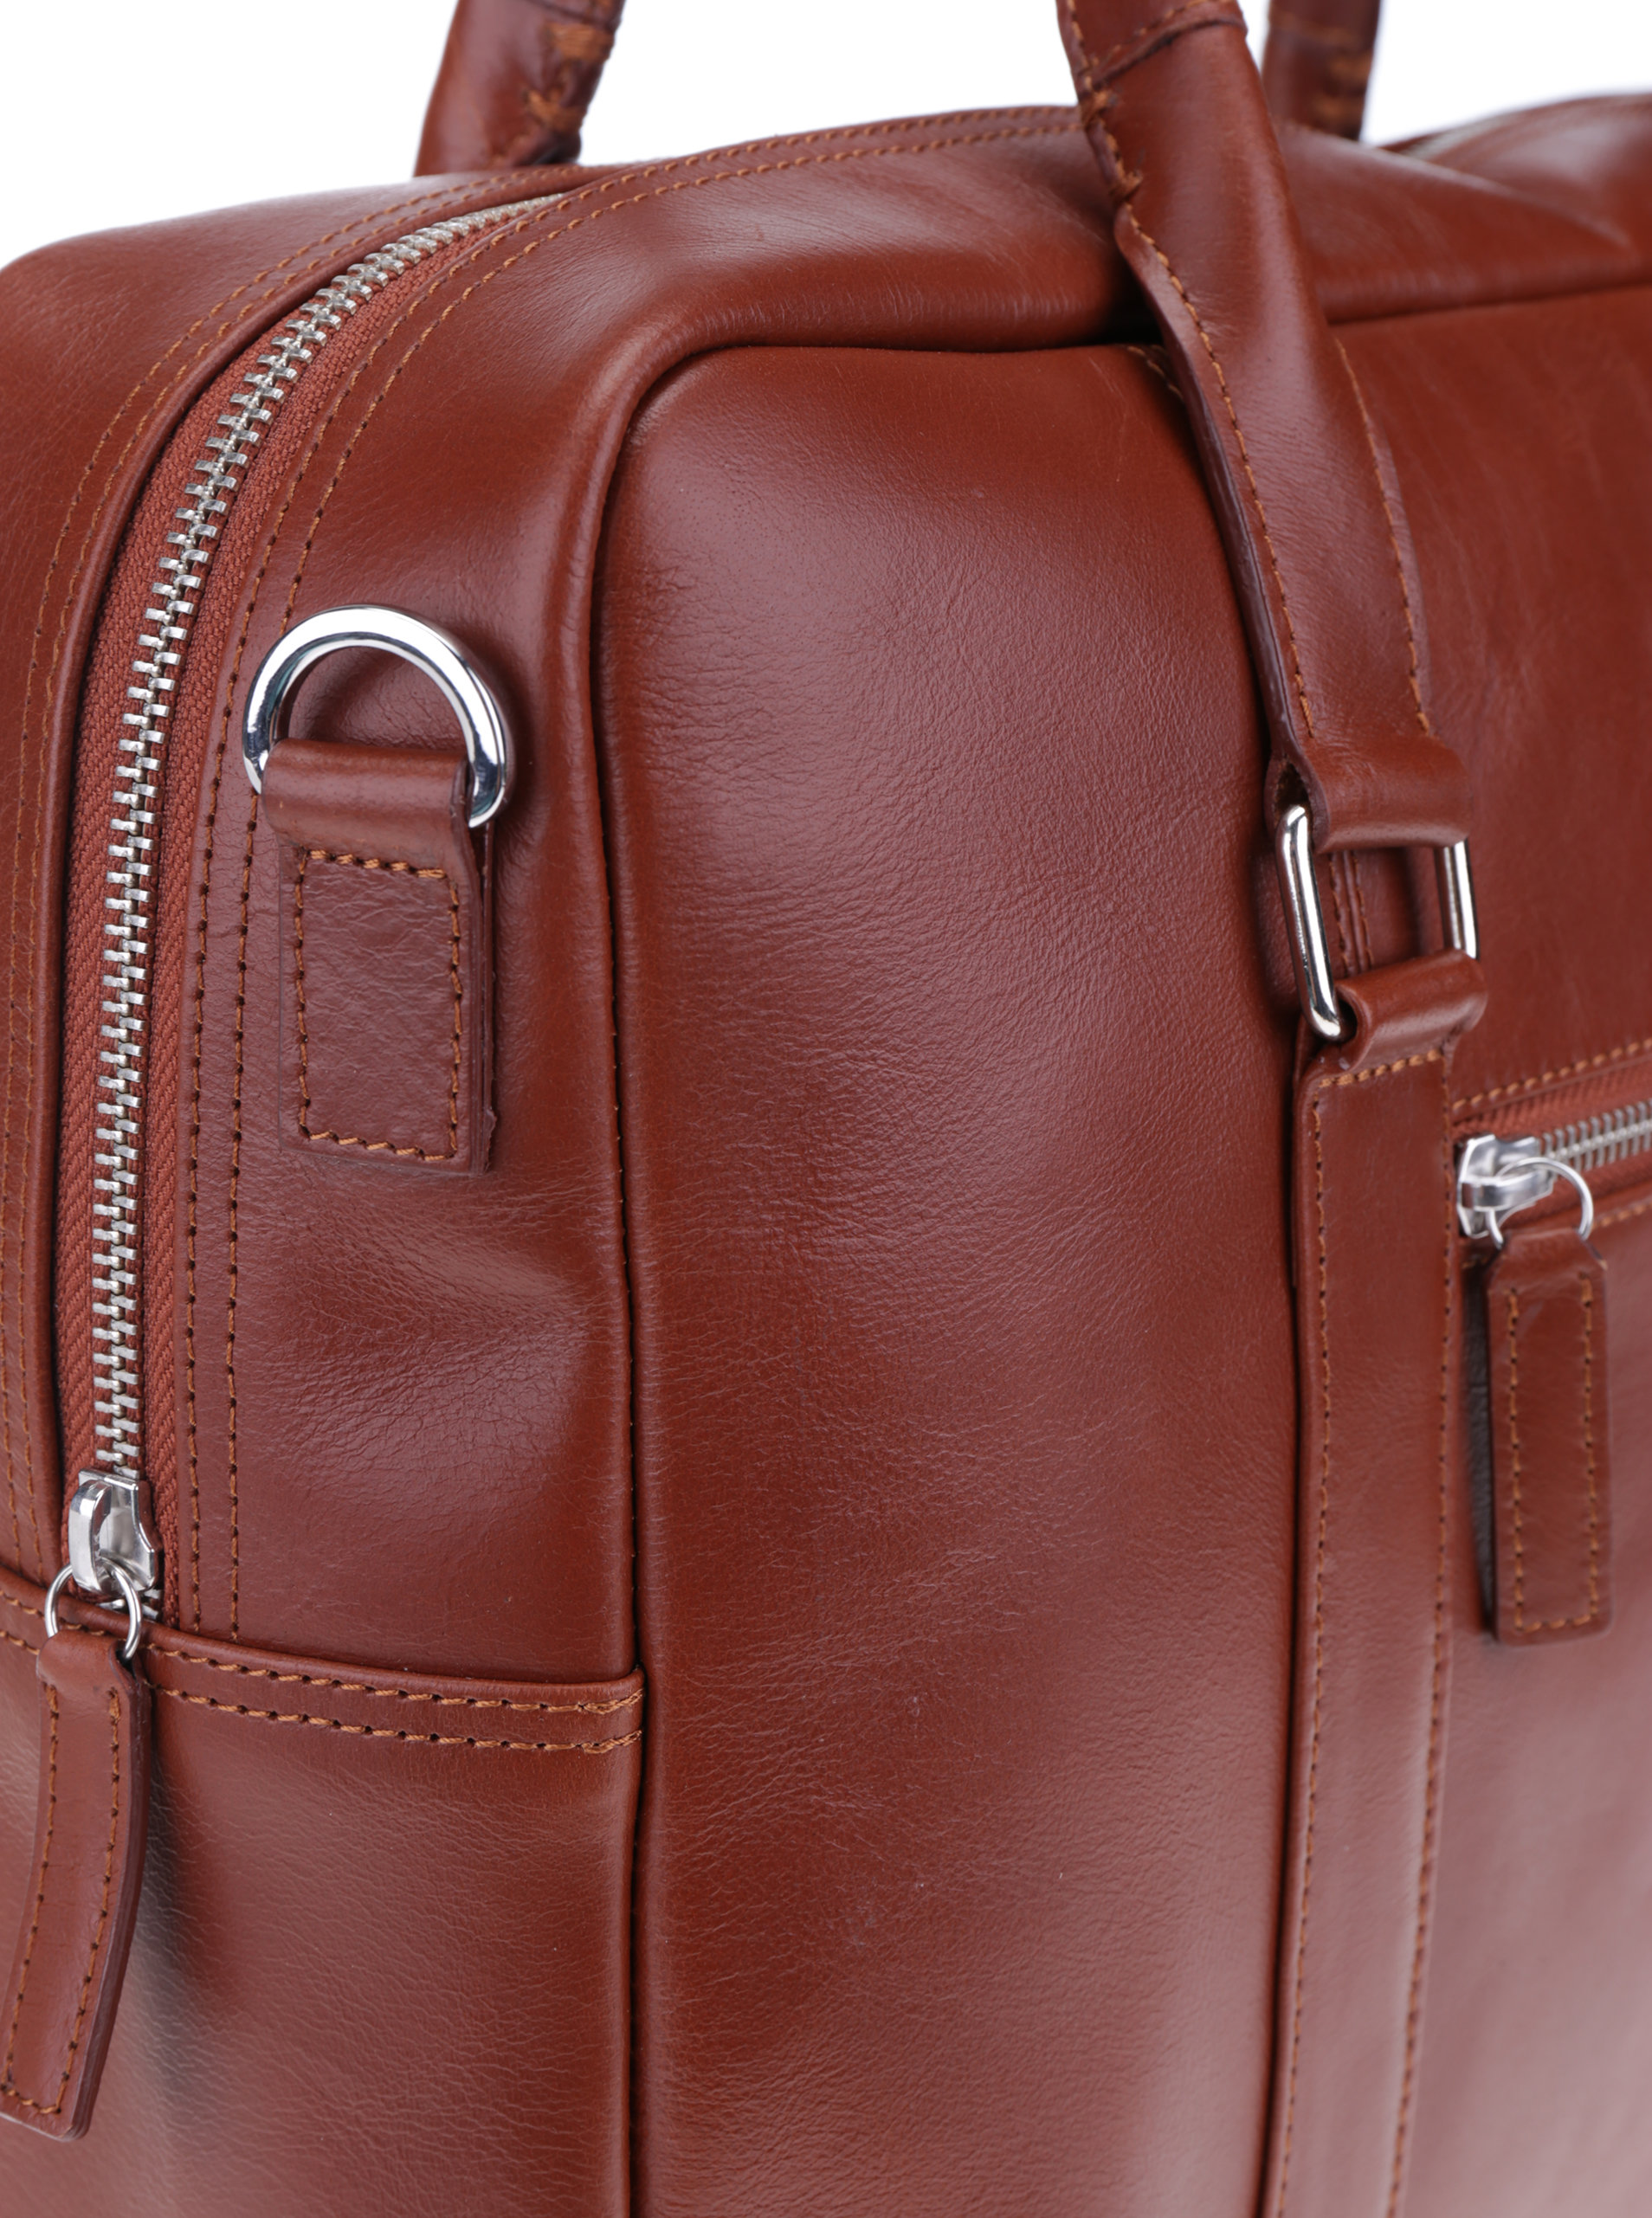 7317dcca9c Hnedá dámska kožená taška na notebook Royal RepubliQ ...